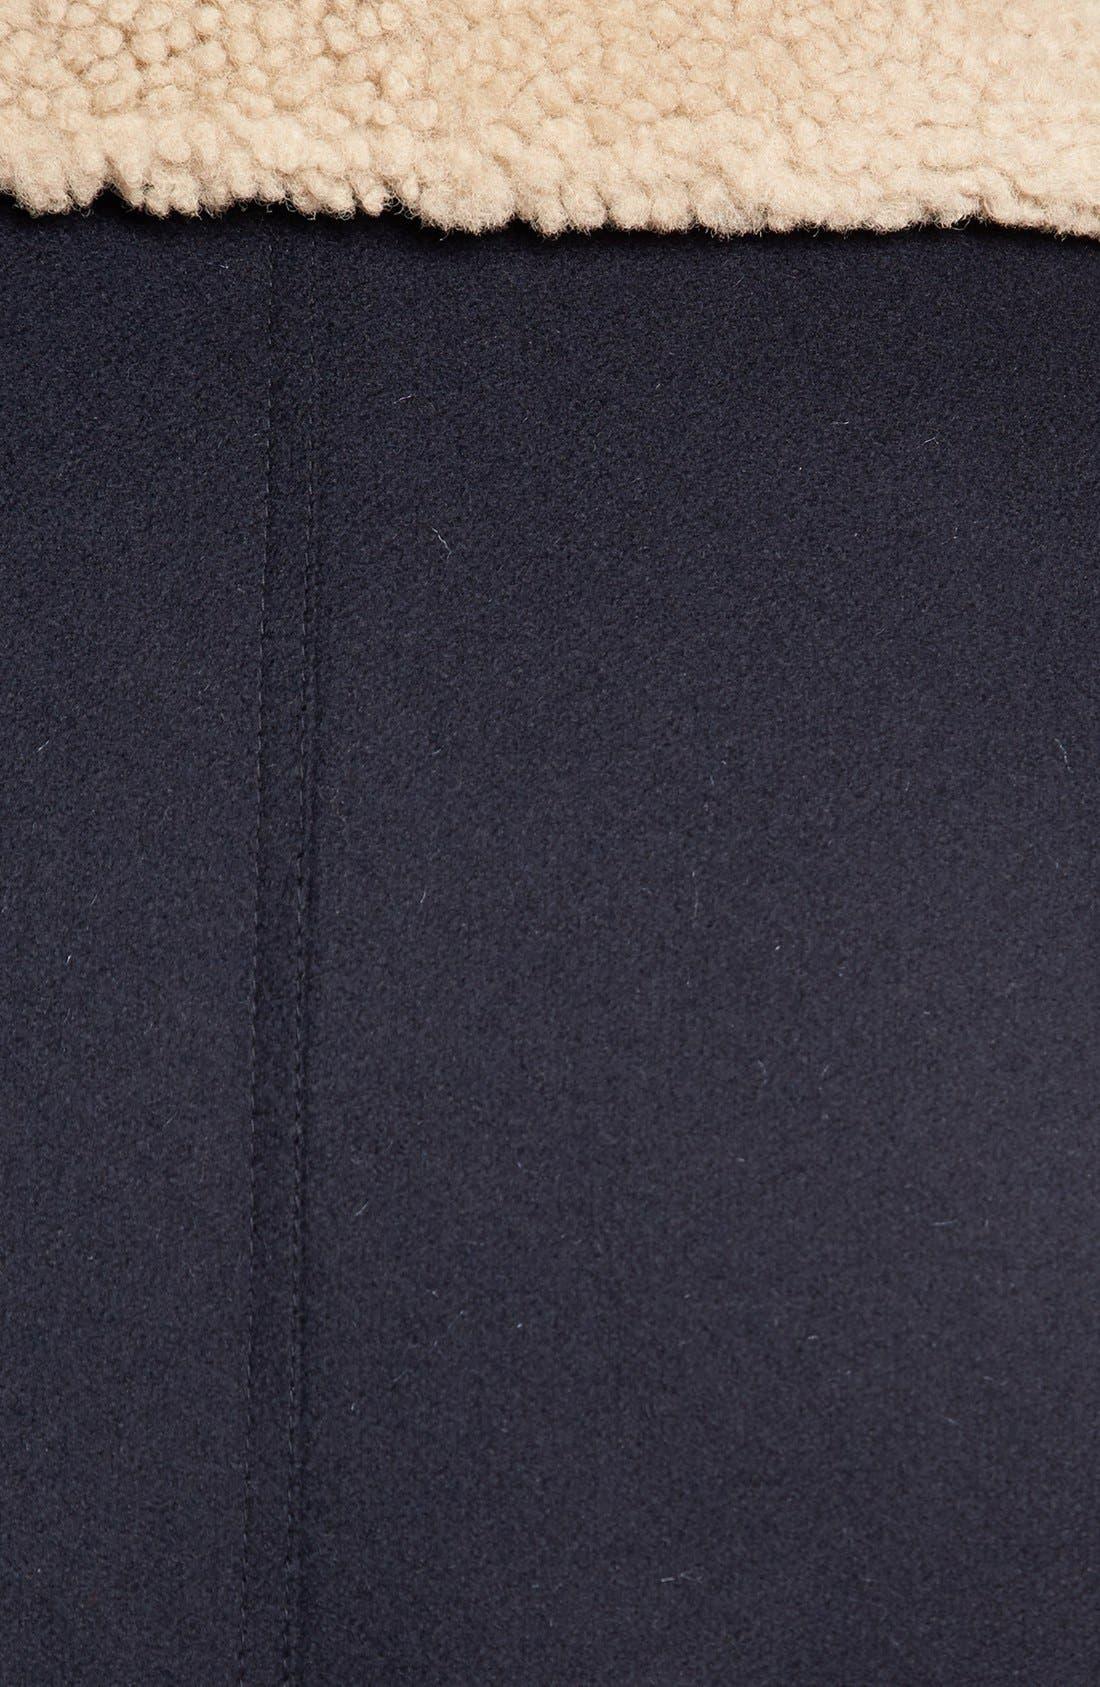 Alternate Image 3  - AMI Alexandre Mattiussi Wool & Genuine Shearling Bomber Jacket